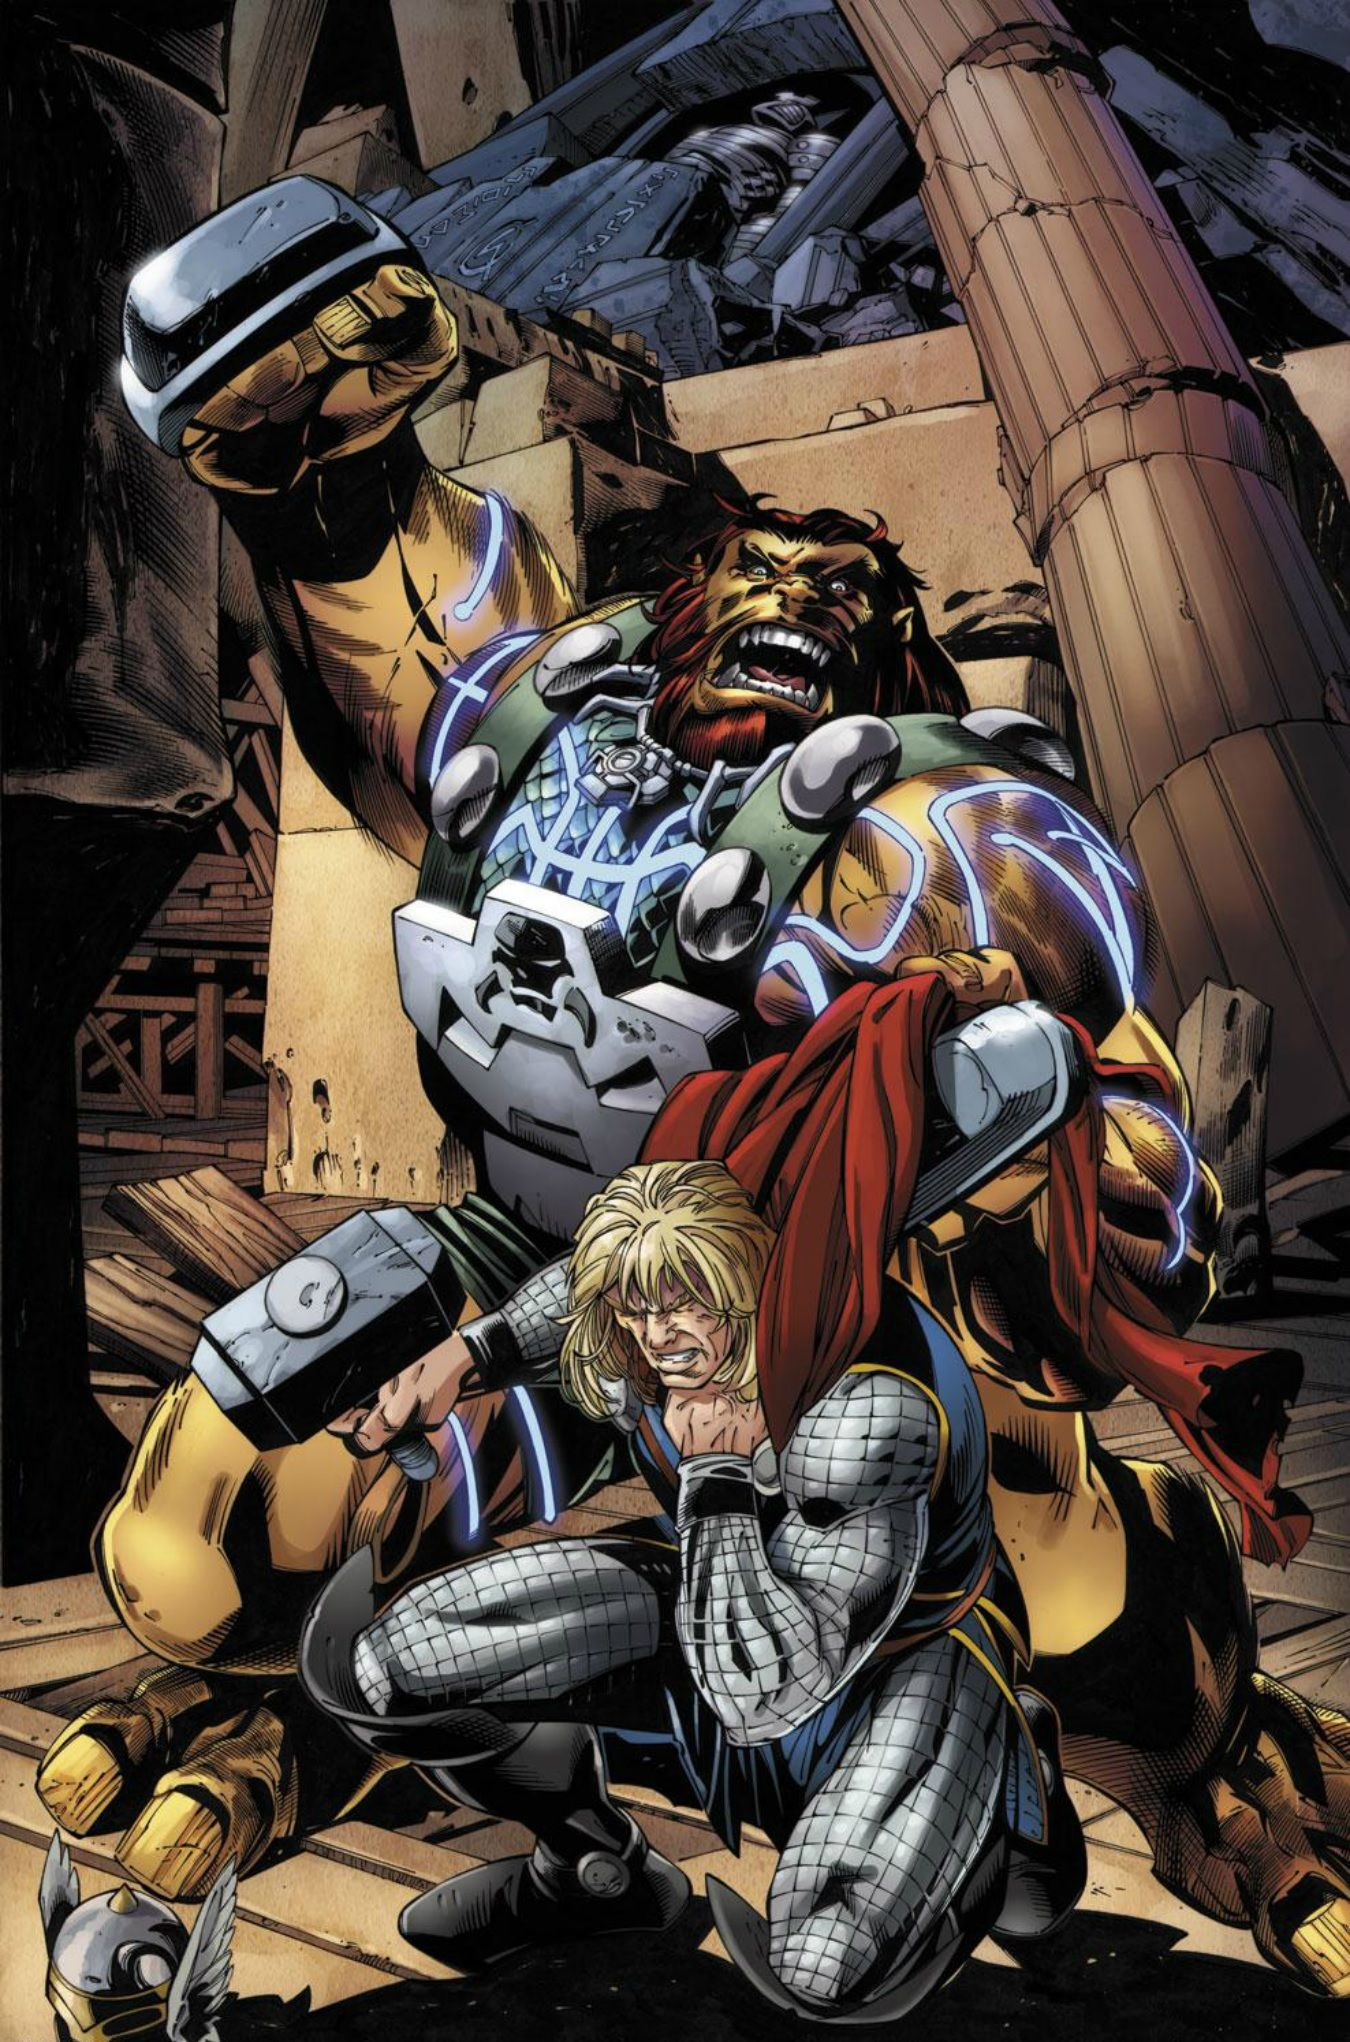 Thor vs ulik by scot eaton avengers enemies and allies pinterest - Mechant avenger ...